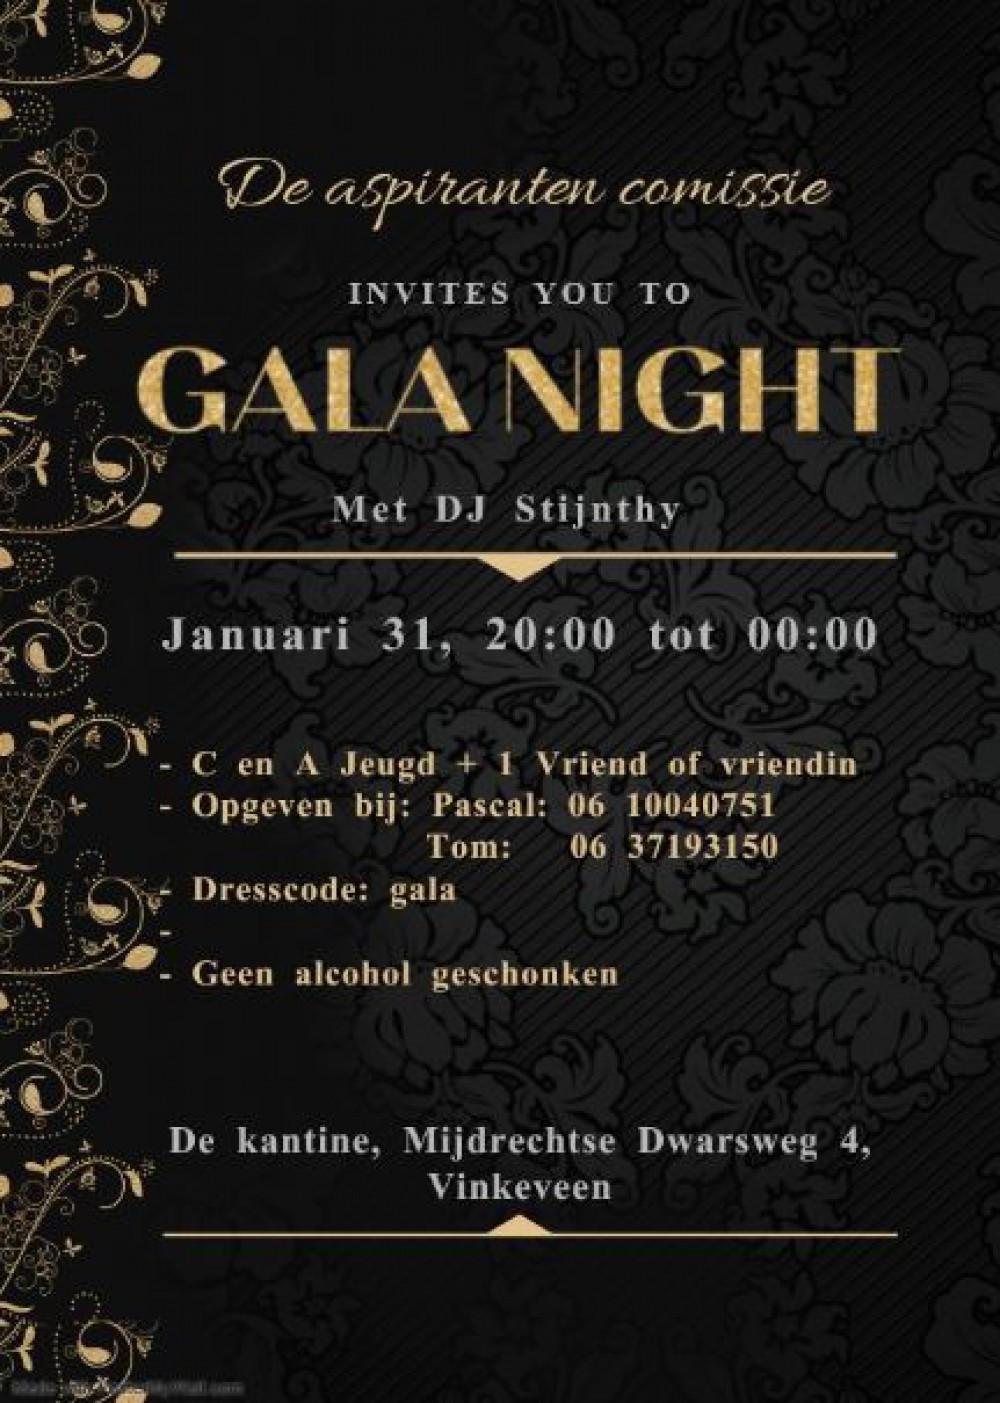 Galanight 31 januari